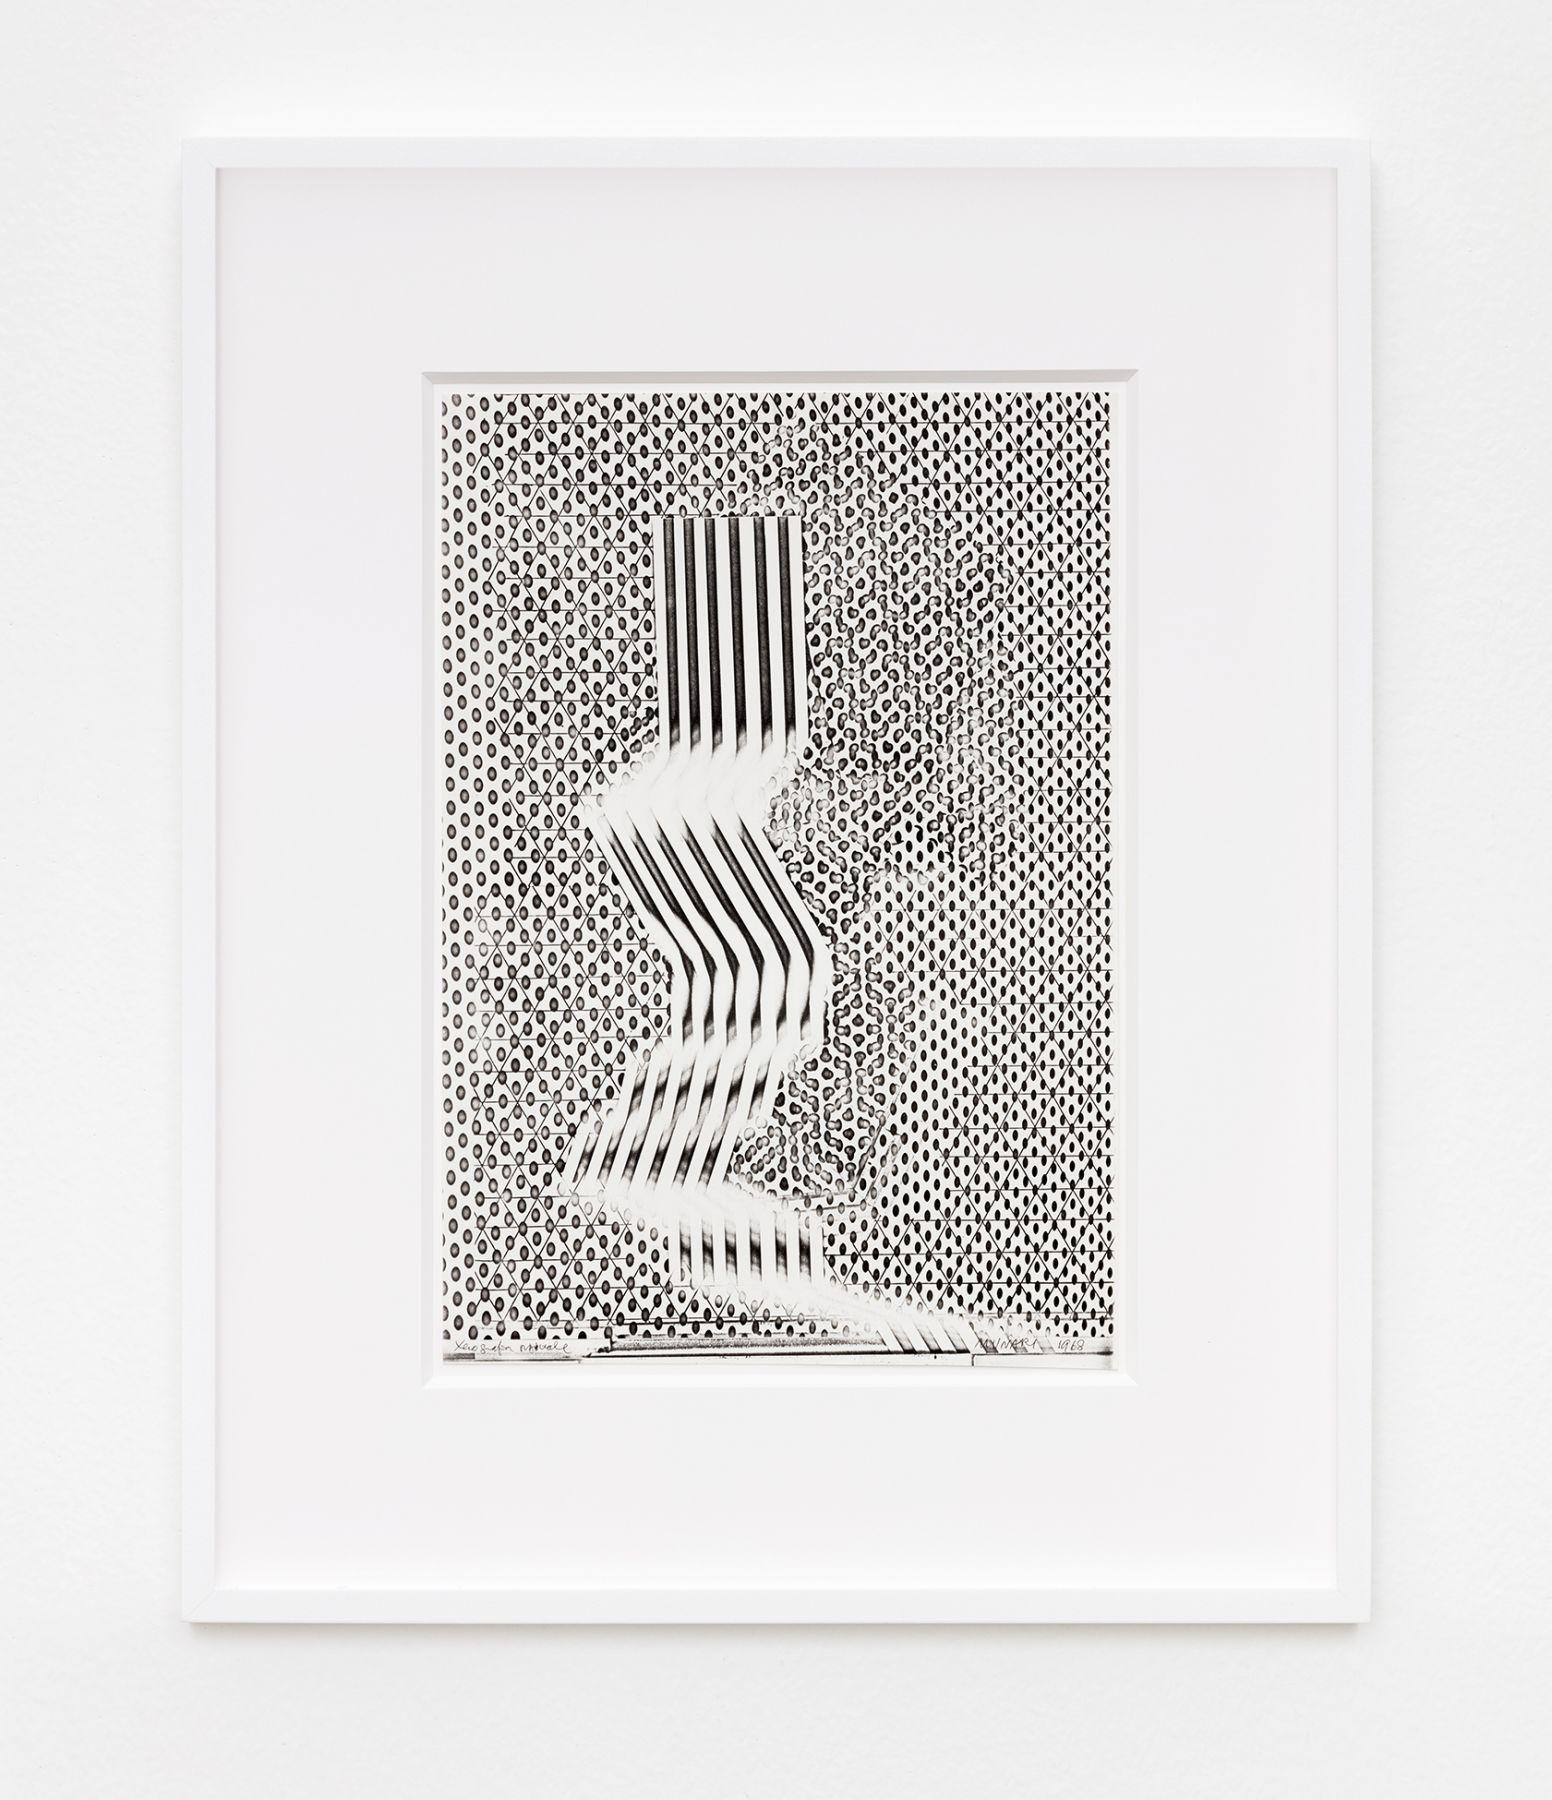 Bruno Munari Xerografia Originale, 1968